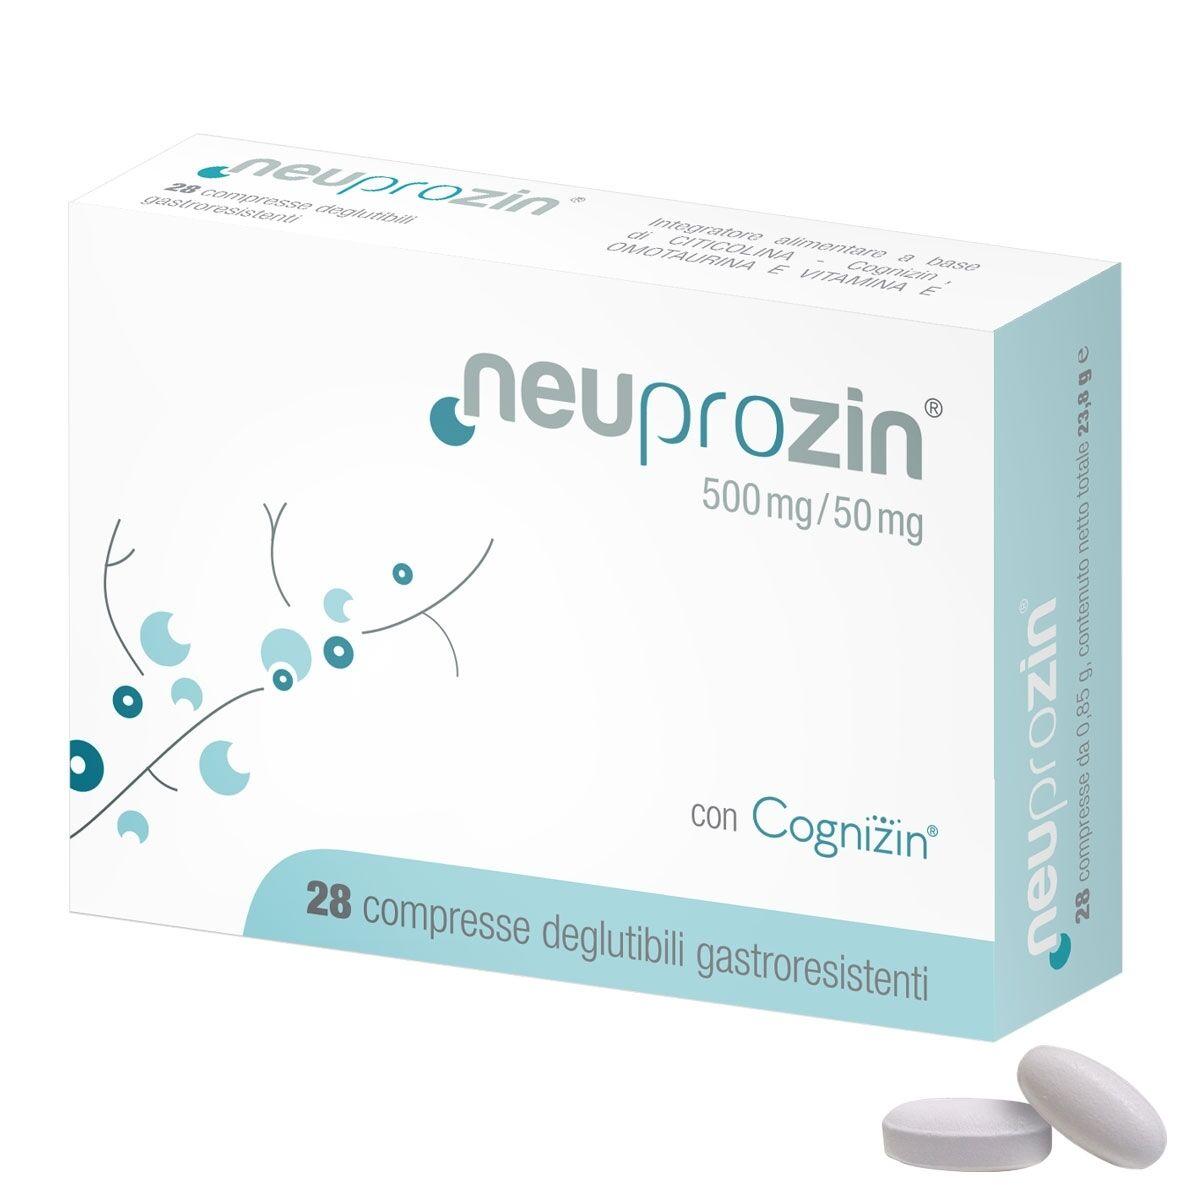 neuprozin integratore alimentare 28 compresse (935809588)